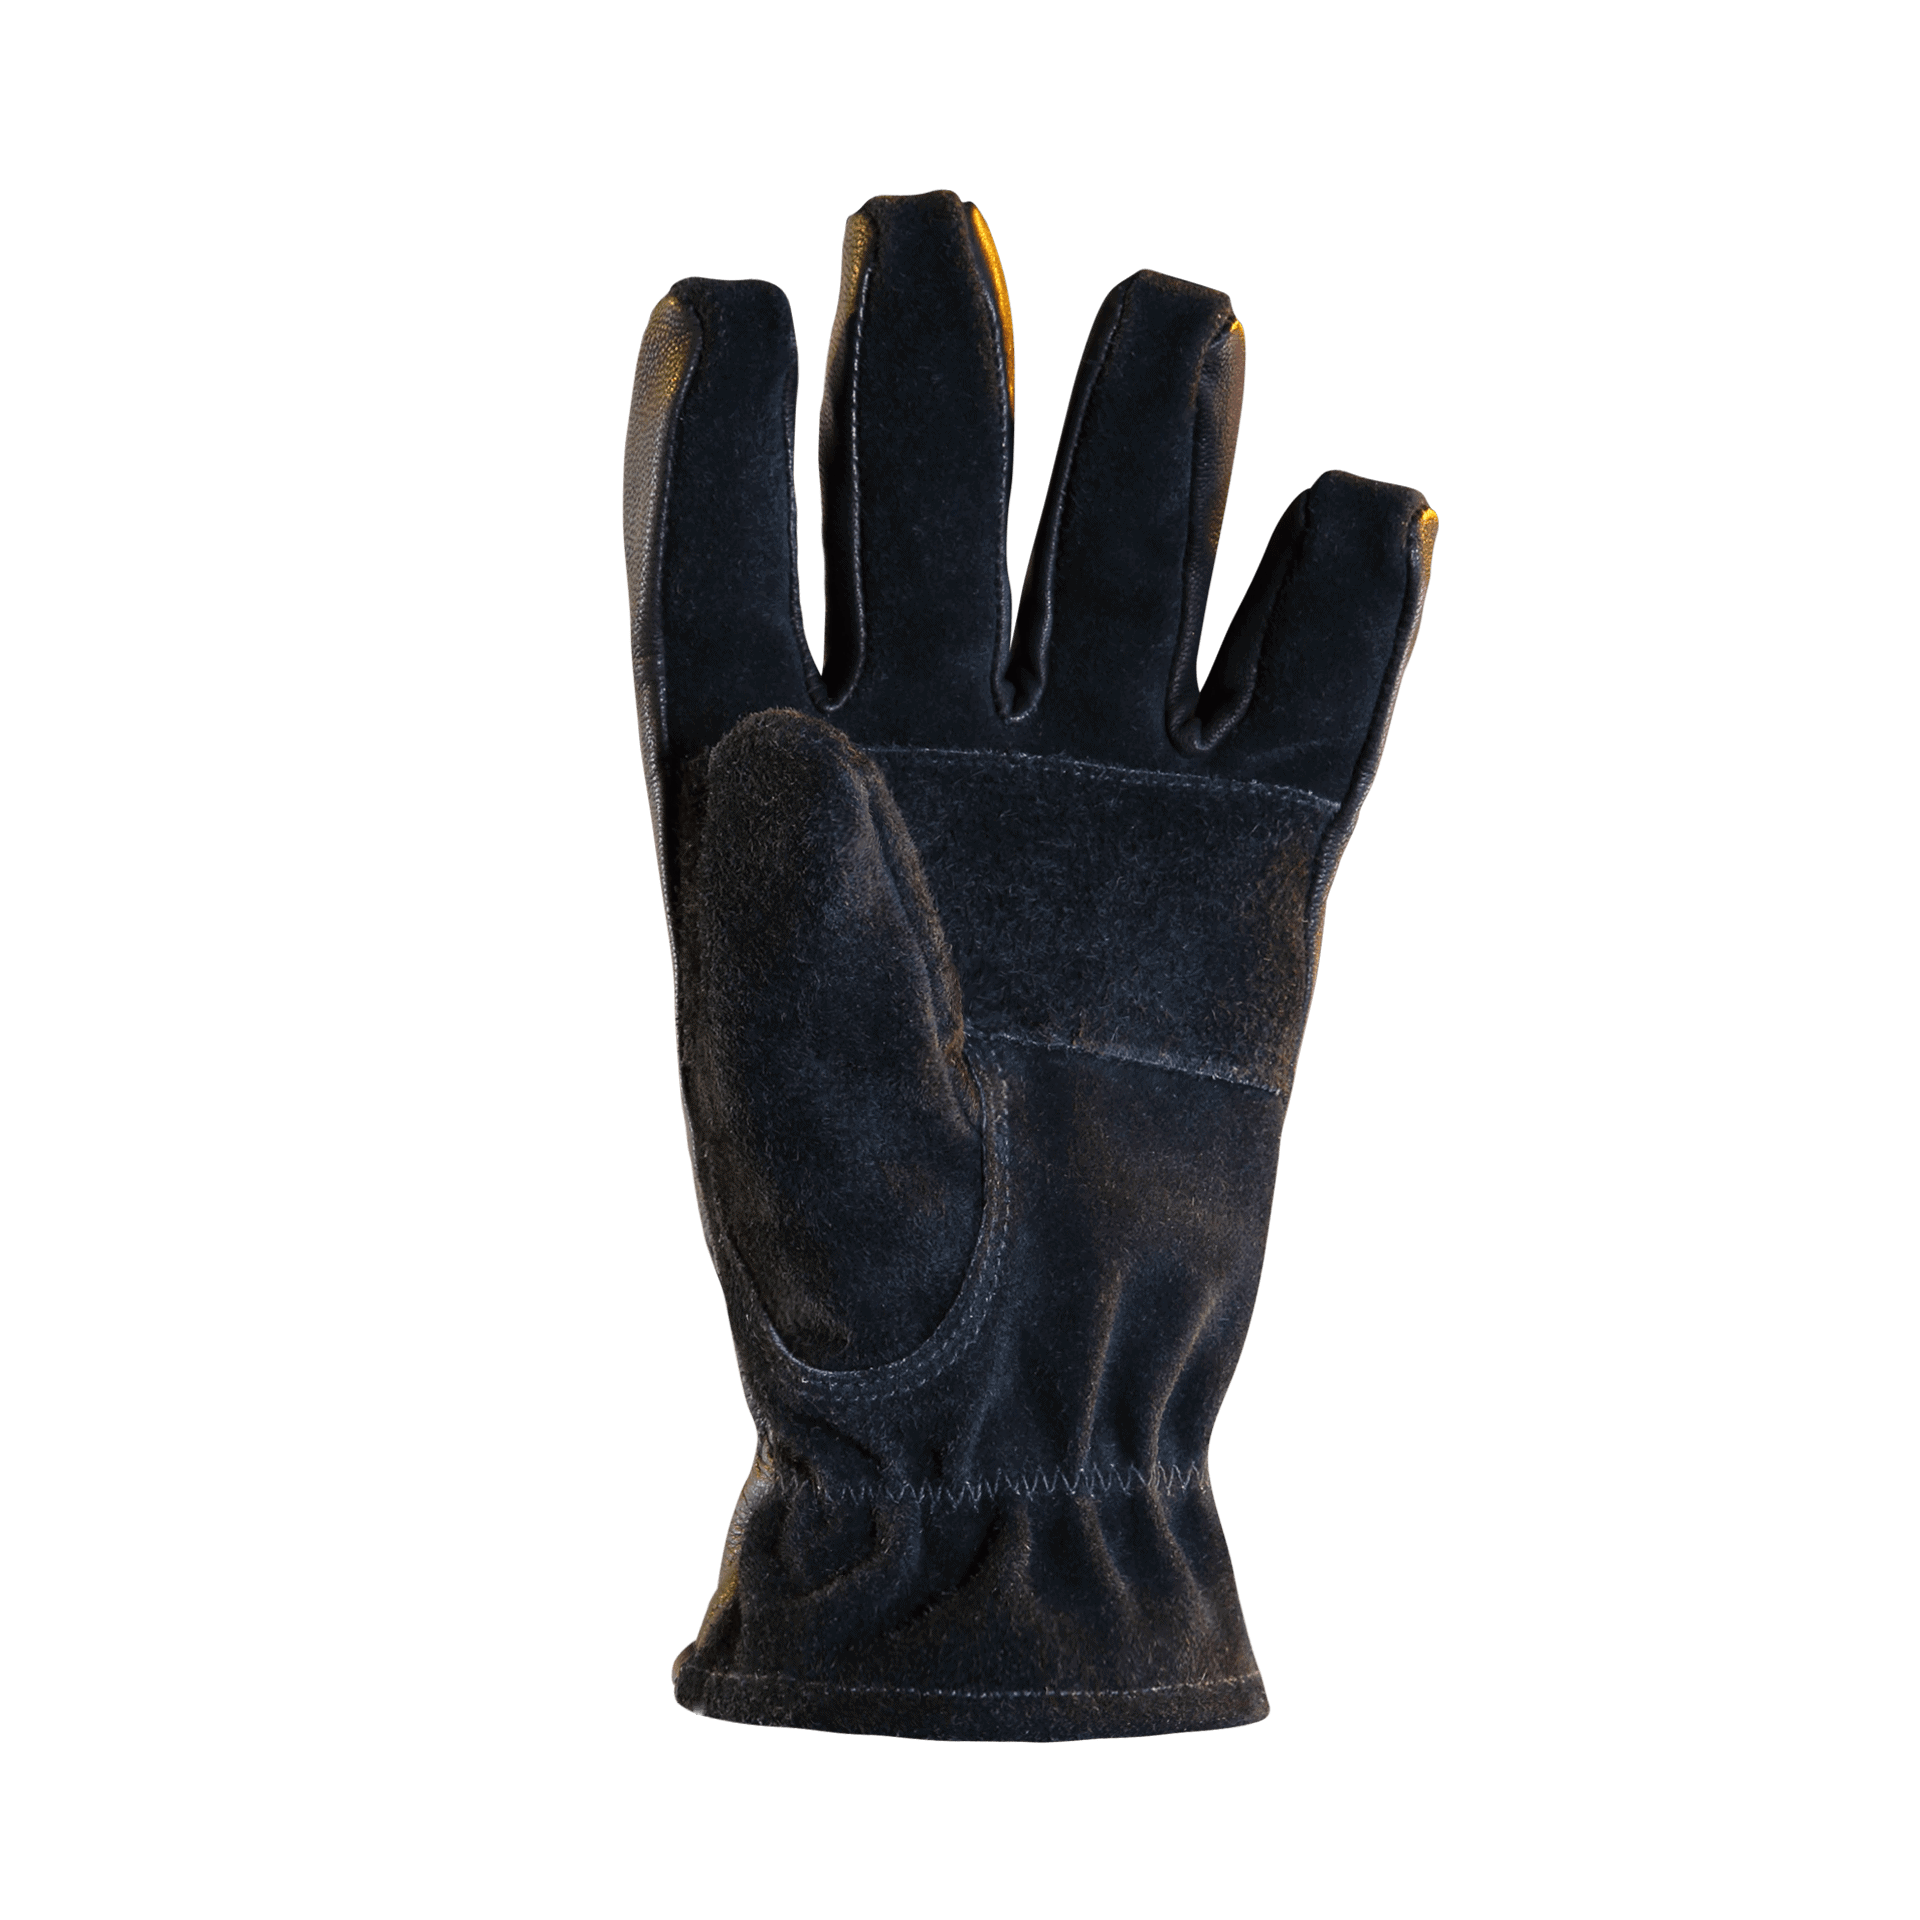 Dex-Pro Fire Glove Palm View